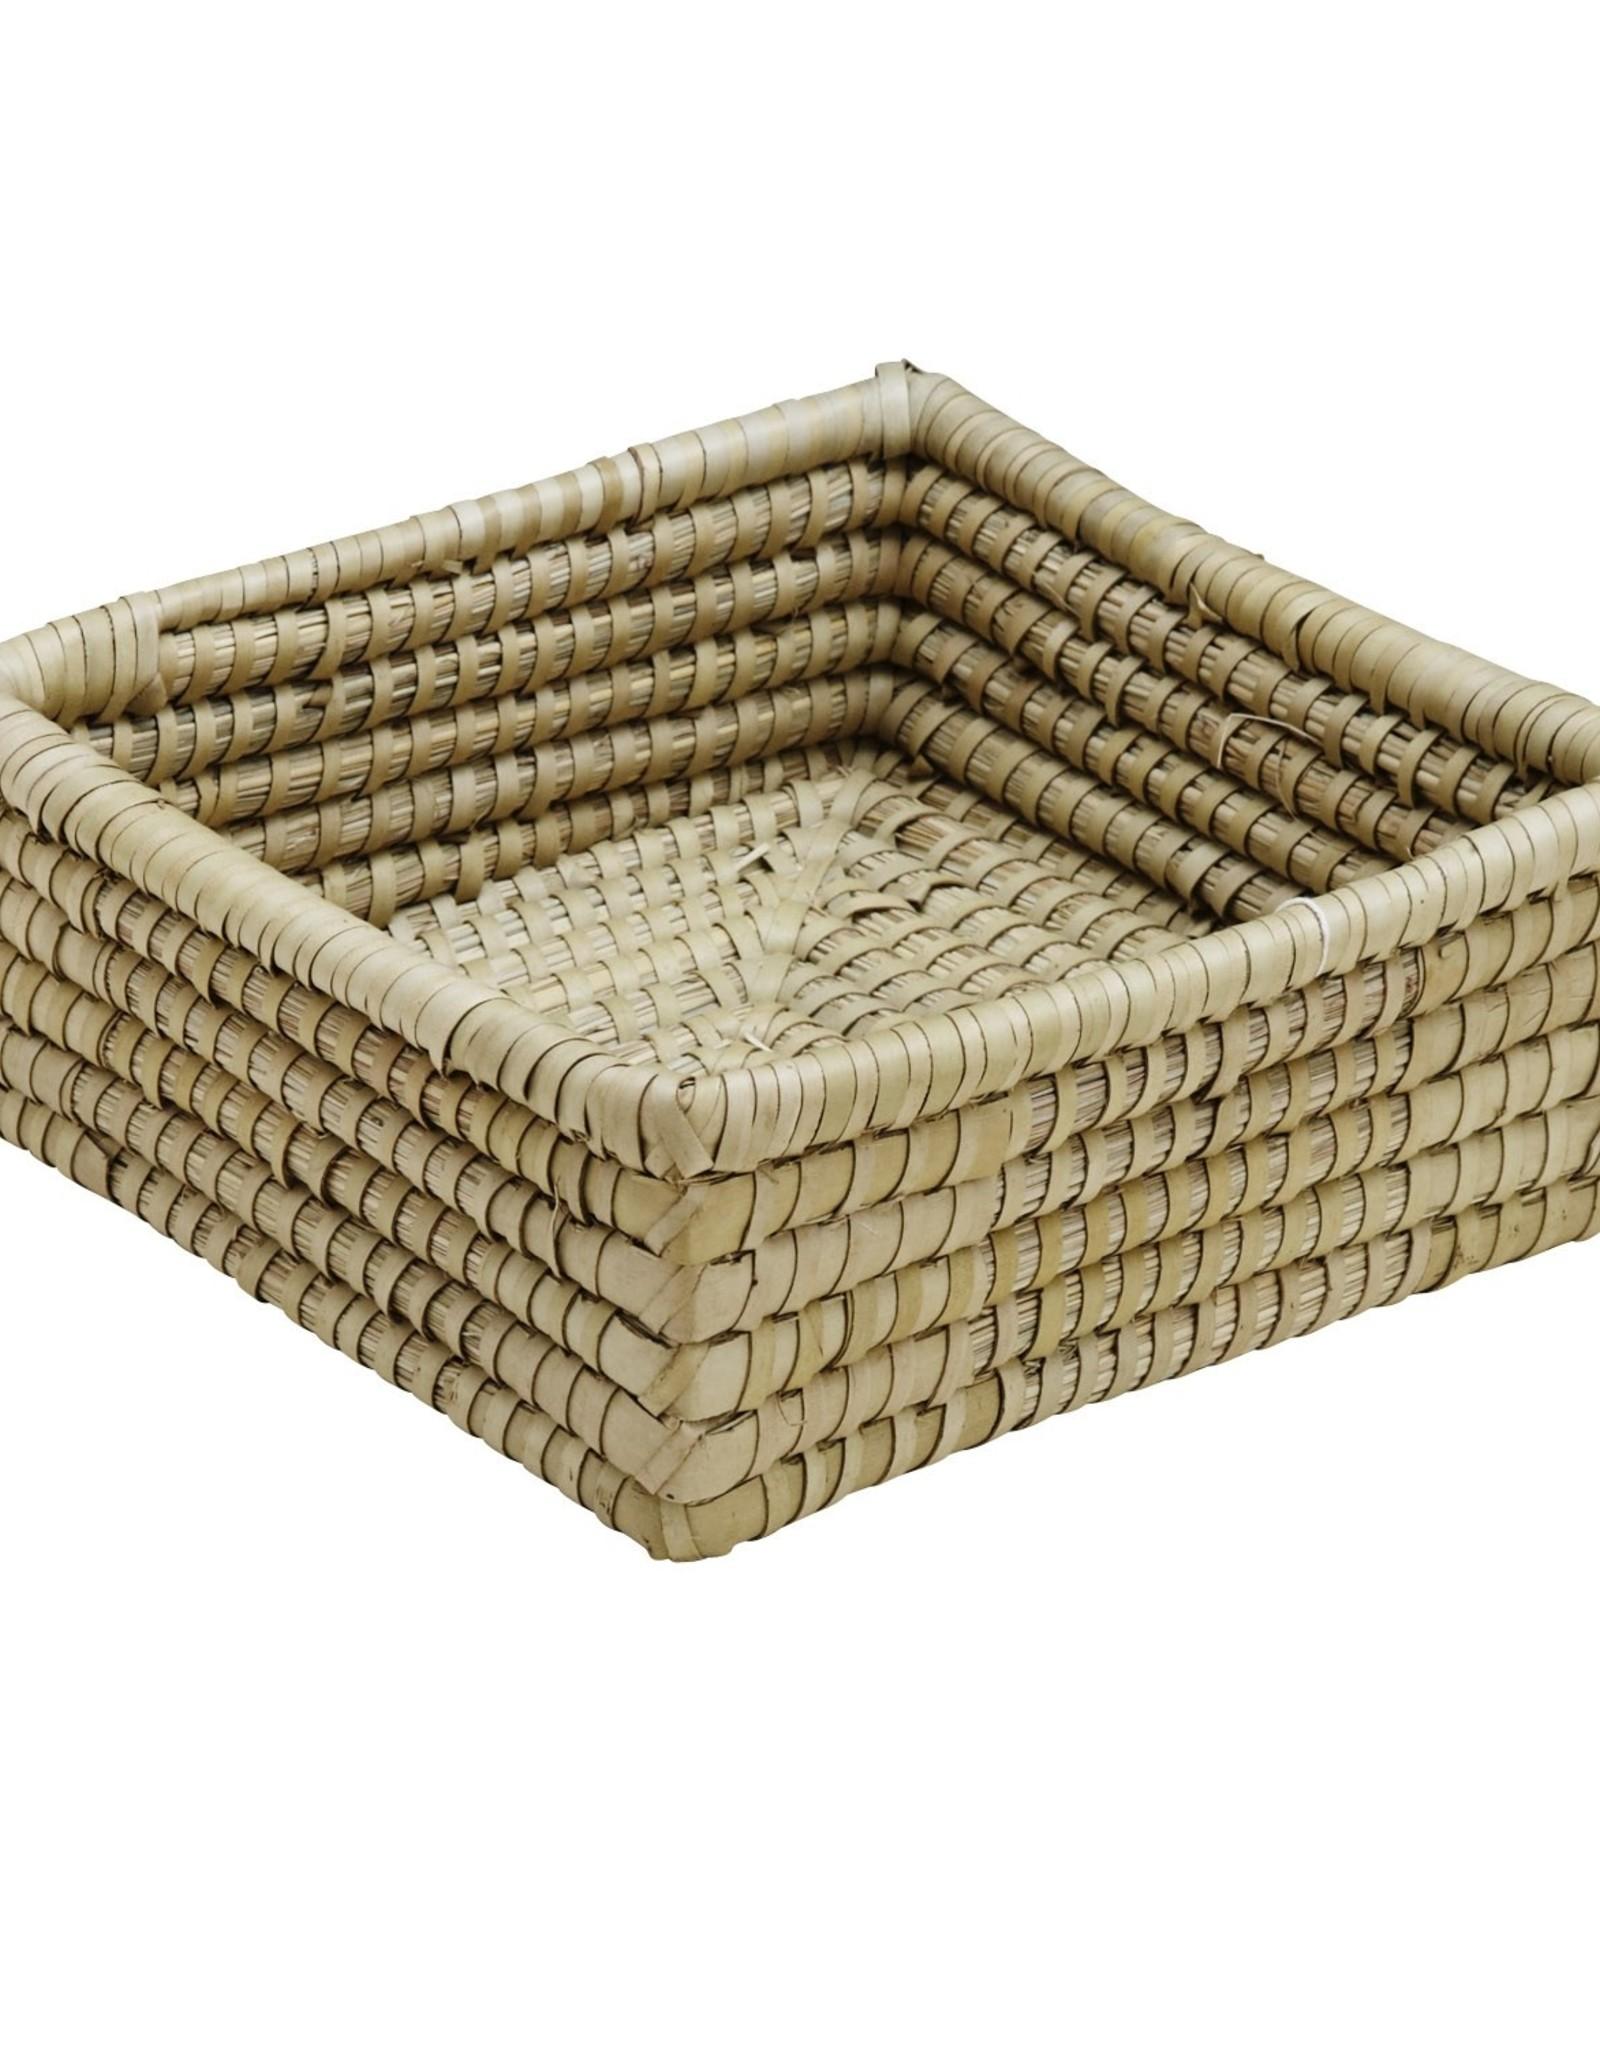 Kaisa Grass Square Basket 9x9